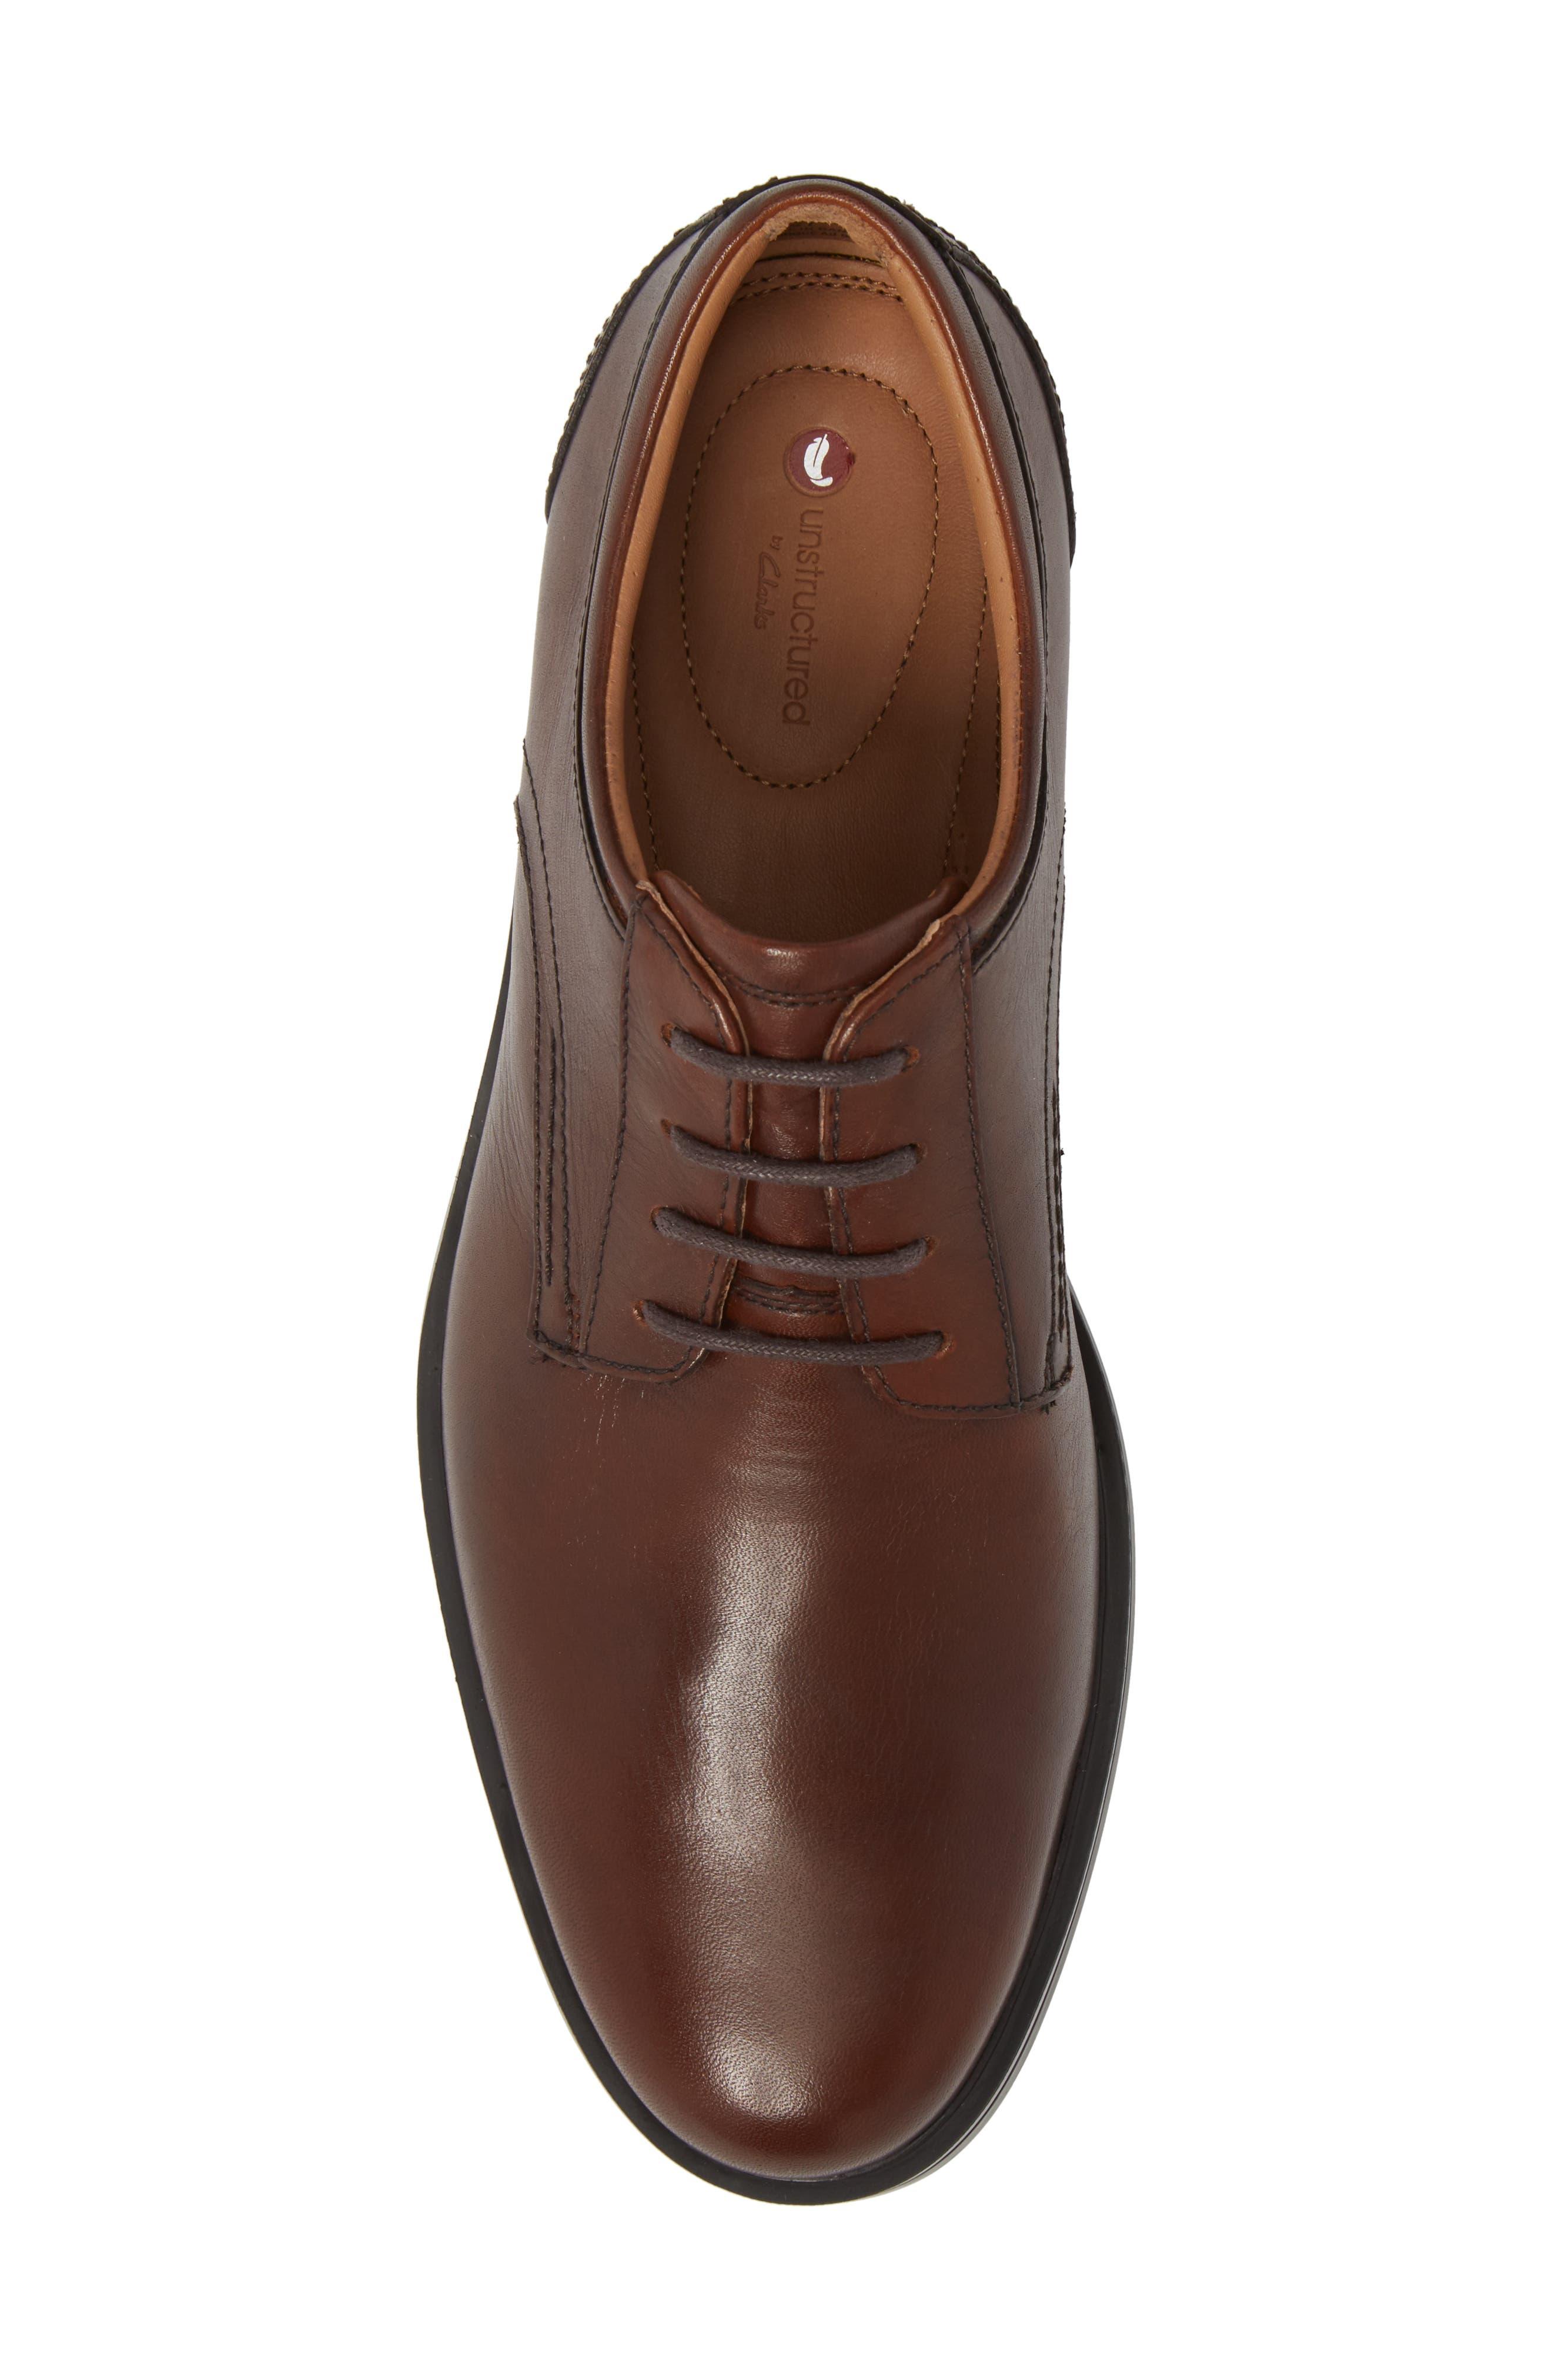 Unaldric Plain Toe Derby,                             Alternate thumbnail 5, color,                             Dark Tan Leather